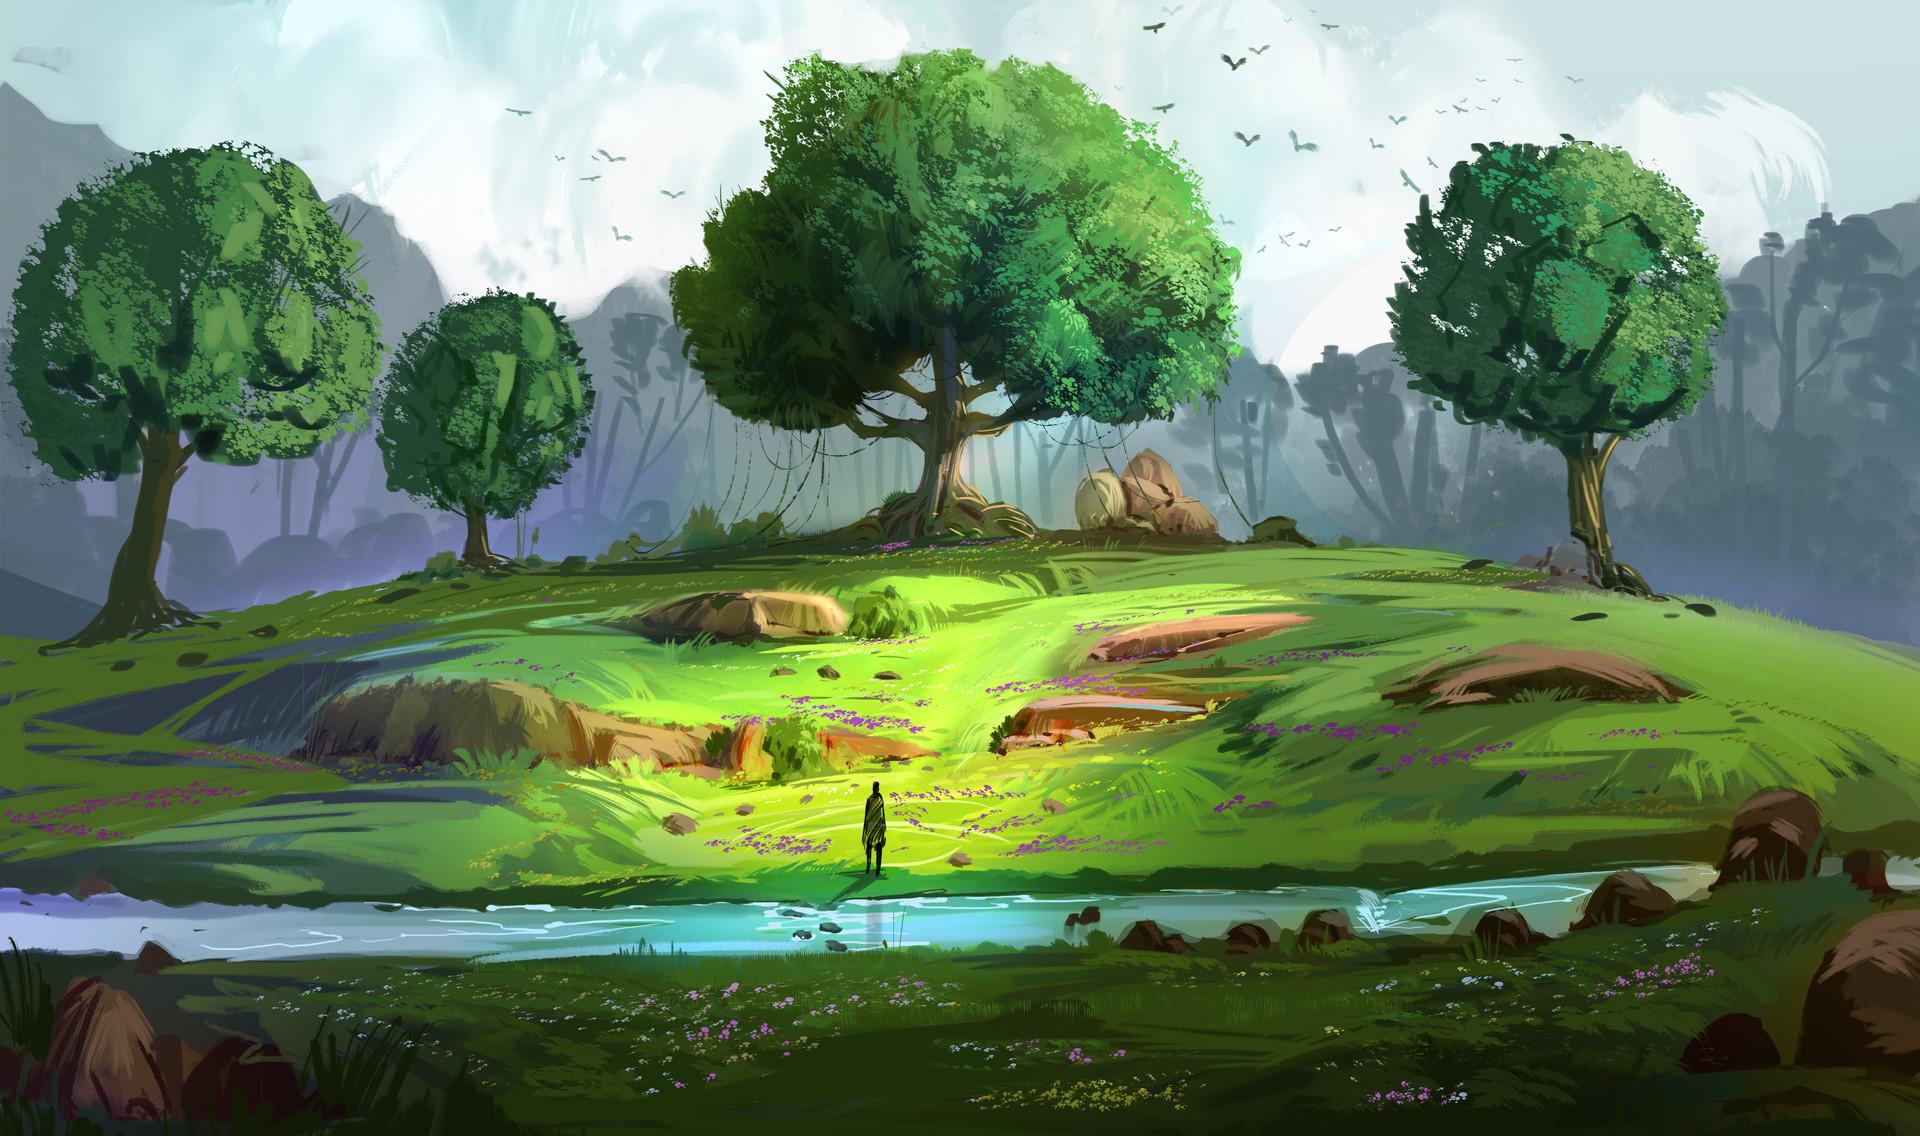 Bohlool belarak tree 06 05